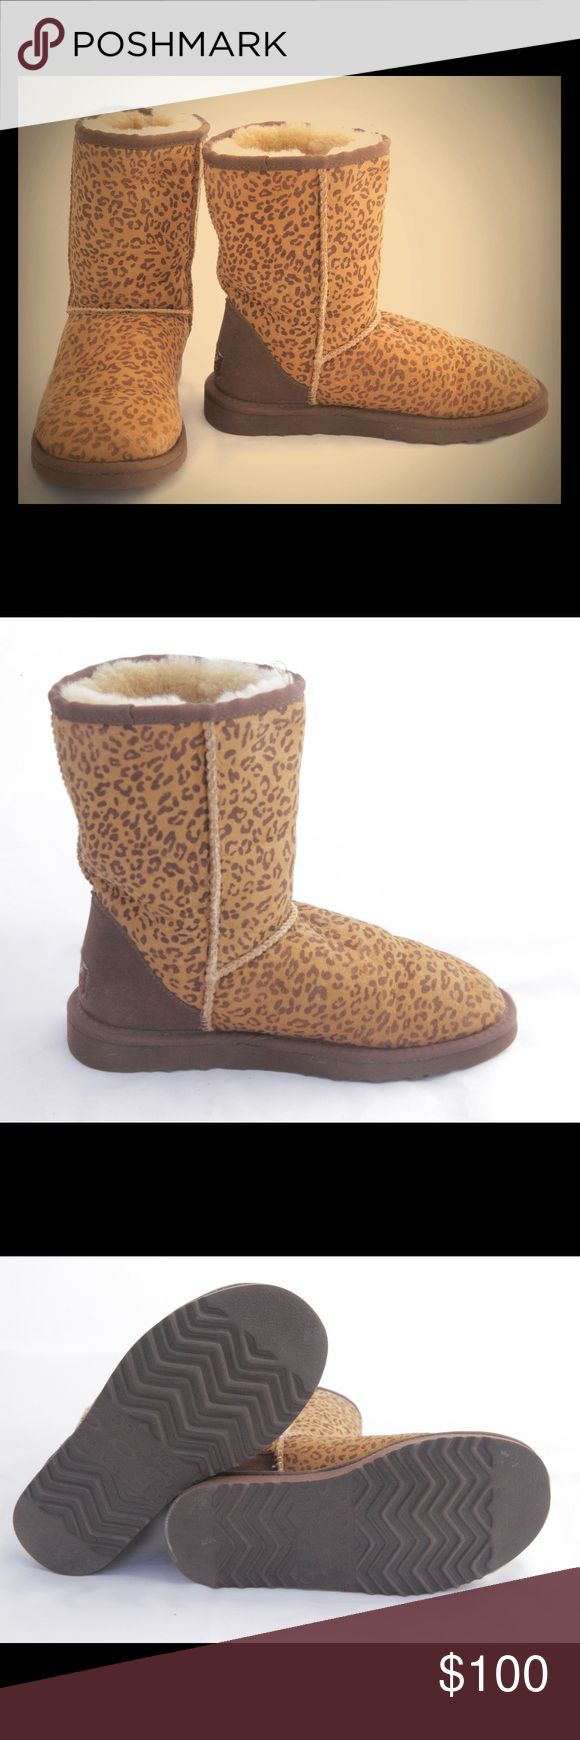 UGG boots Leopard print UGG boots - short, original UGG Shoes Winter & Rain Boots